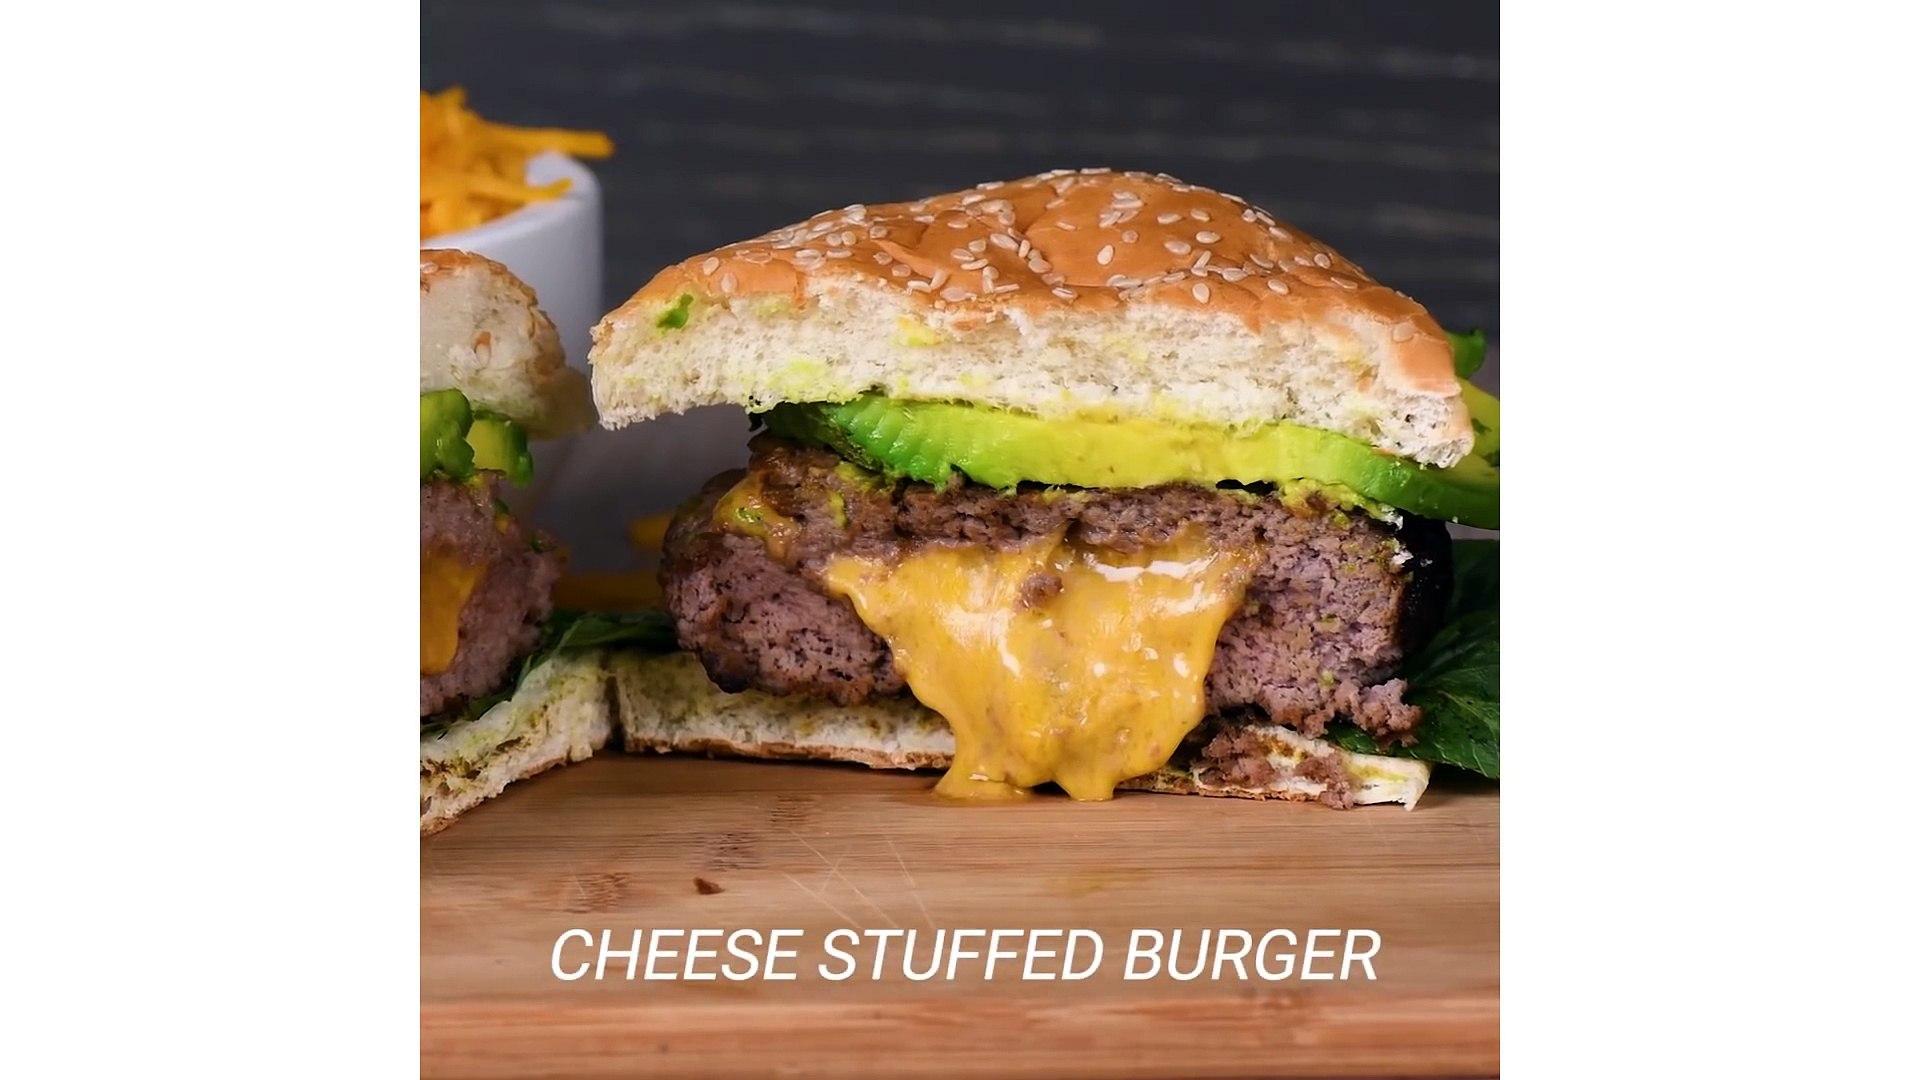 Burger Hacks - 4 Life Changing Burger Hacks - Life Hacks